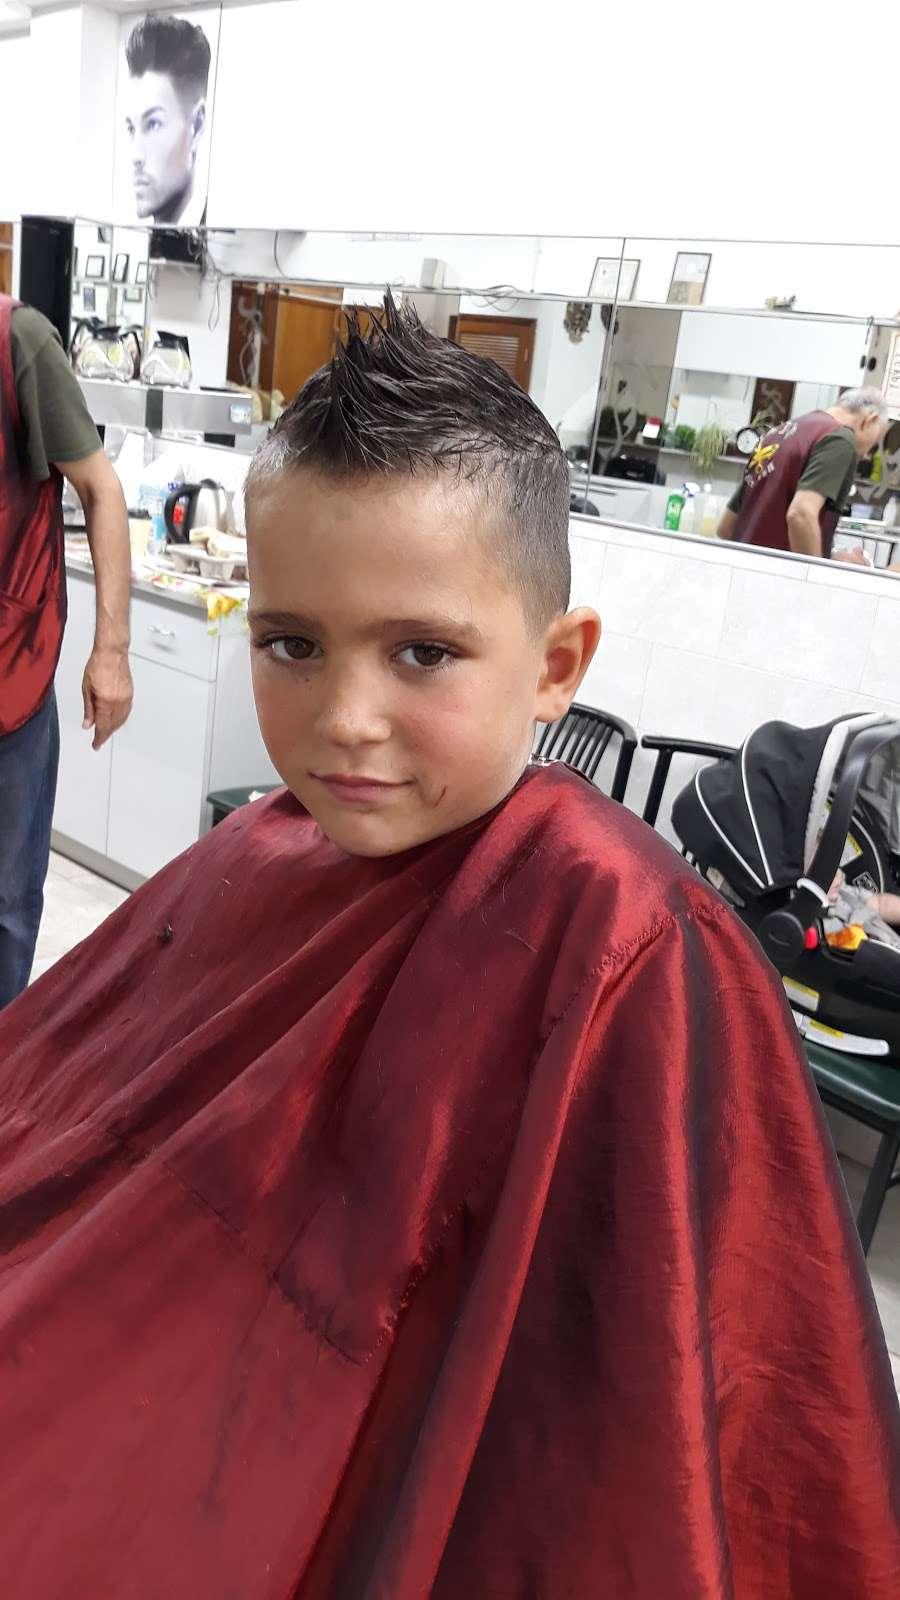 Ideal Barber Shop - hair care  | Photo 4 of 4 | Address: 25307 Union Tpke, Glen Oaks, NY 11004, USA | Phone: (718) 347-9676